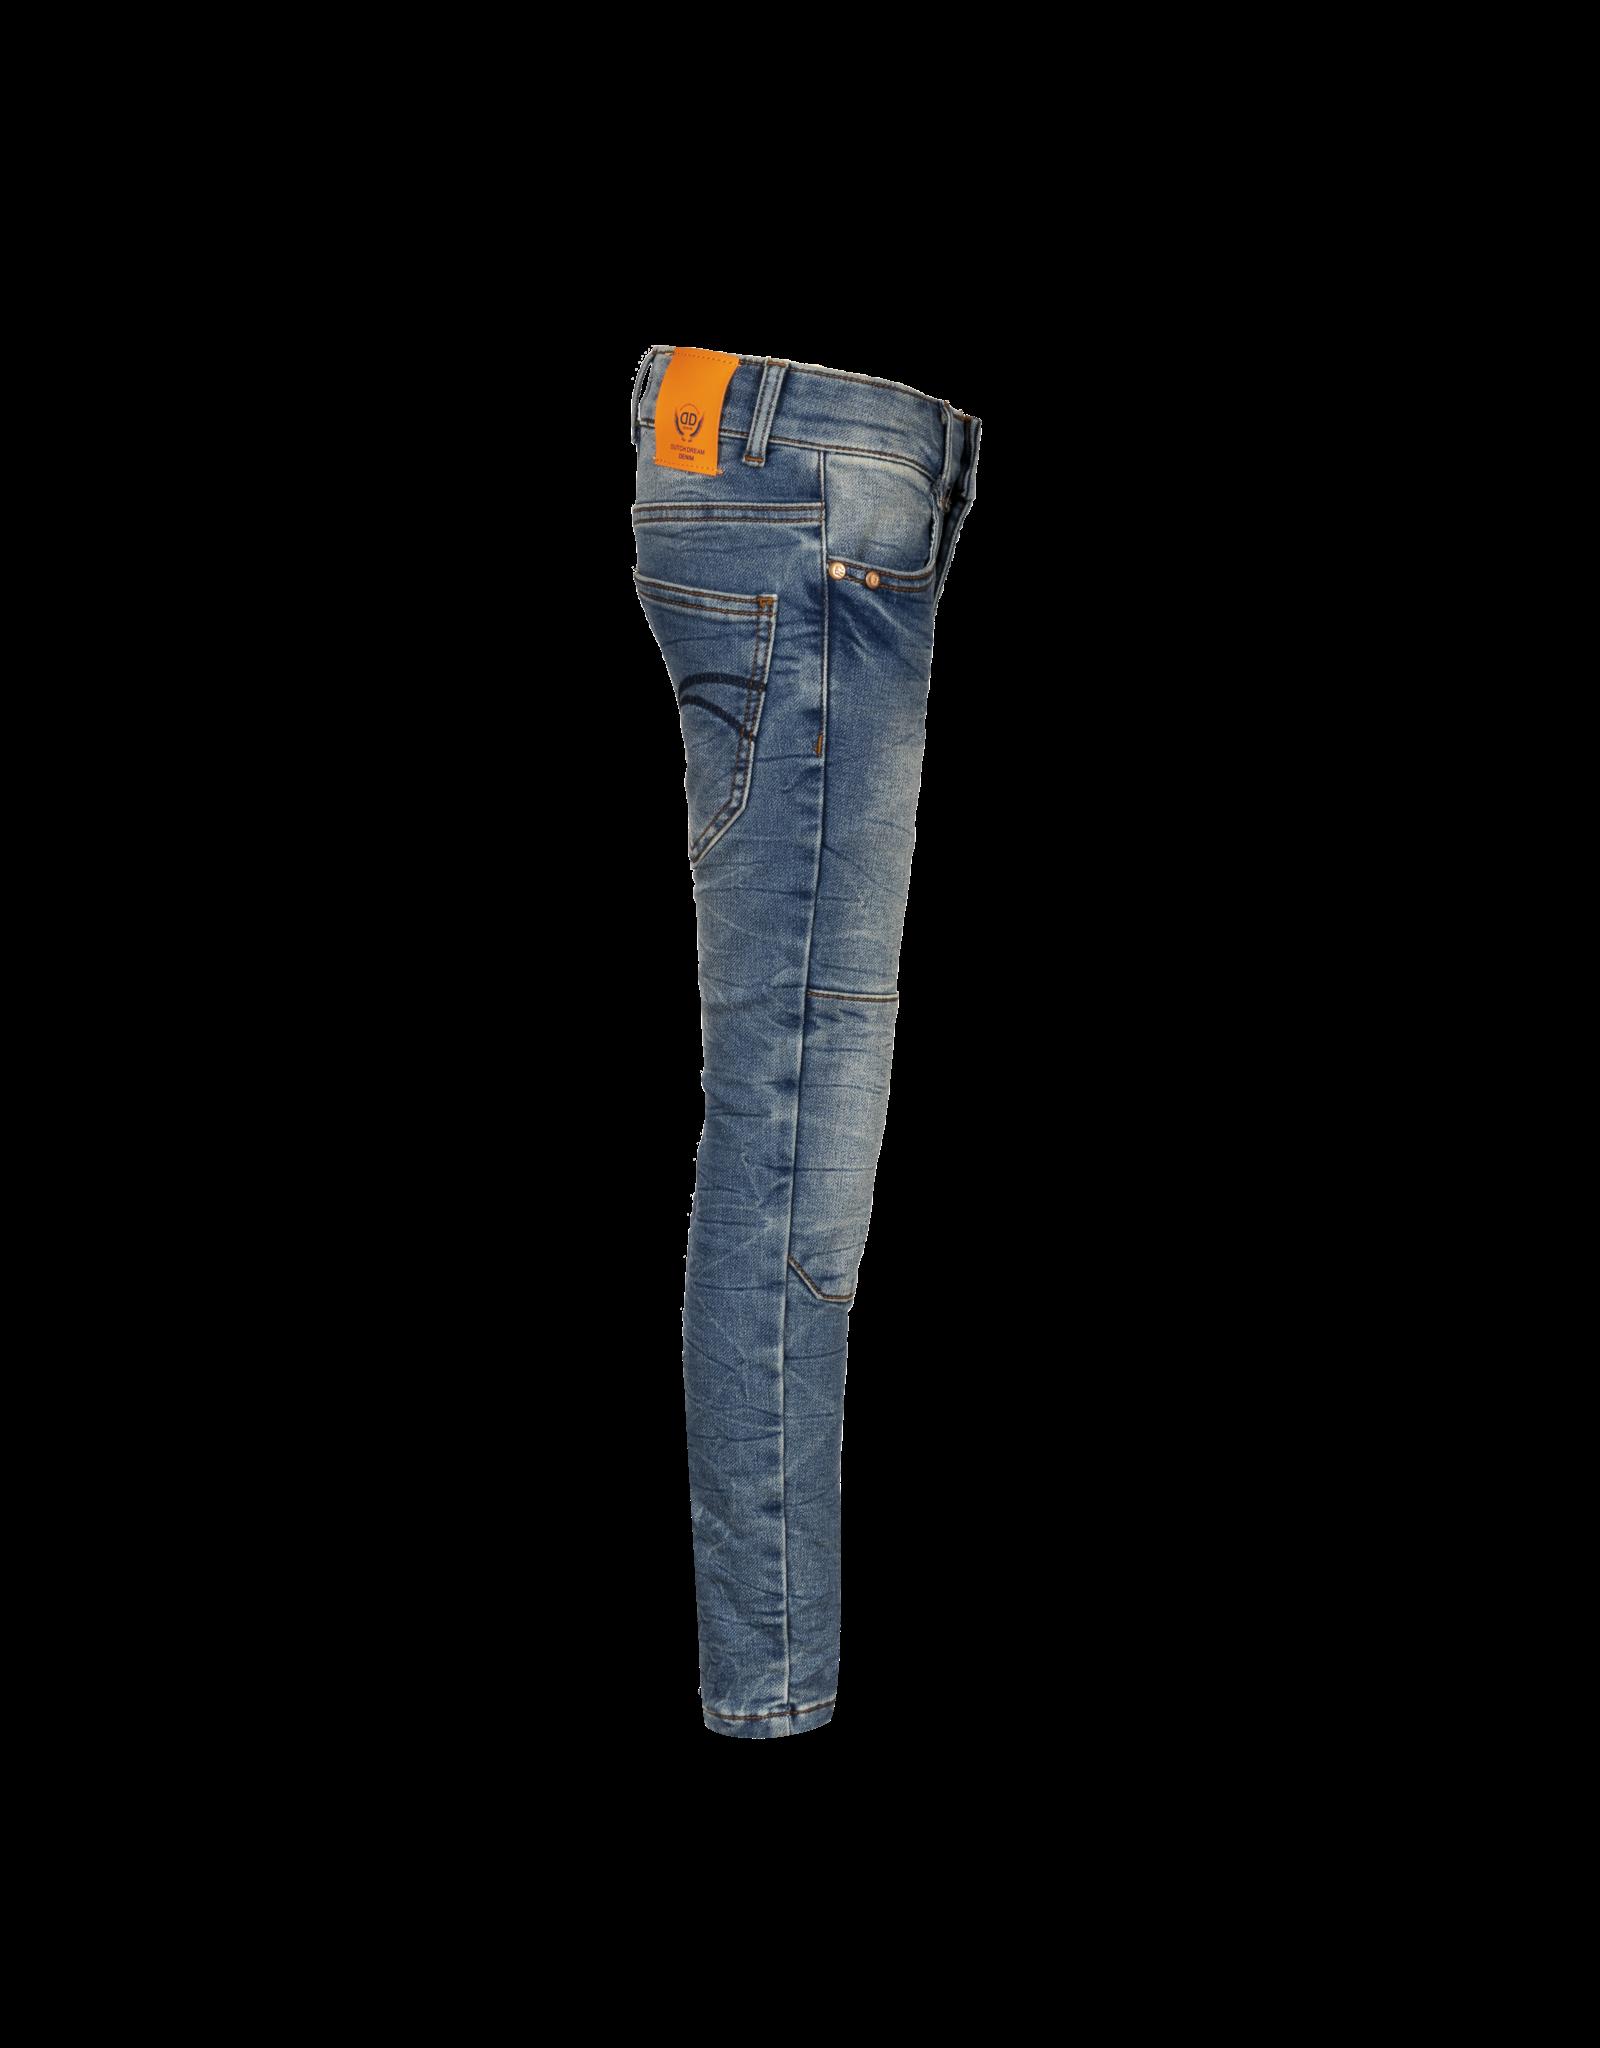 Dutch dream denim JUHUDI, SLIM FIT jogg jeans  met dubbele laag stof op de knieën